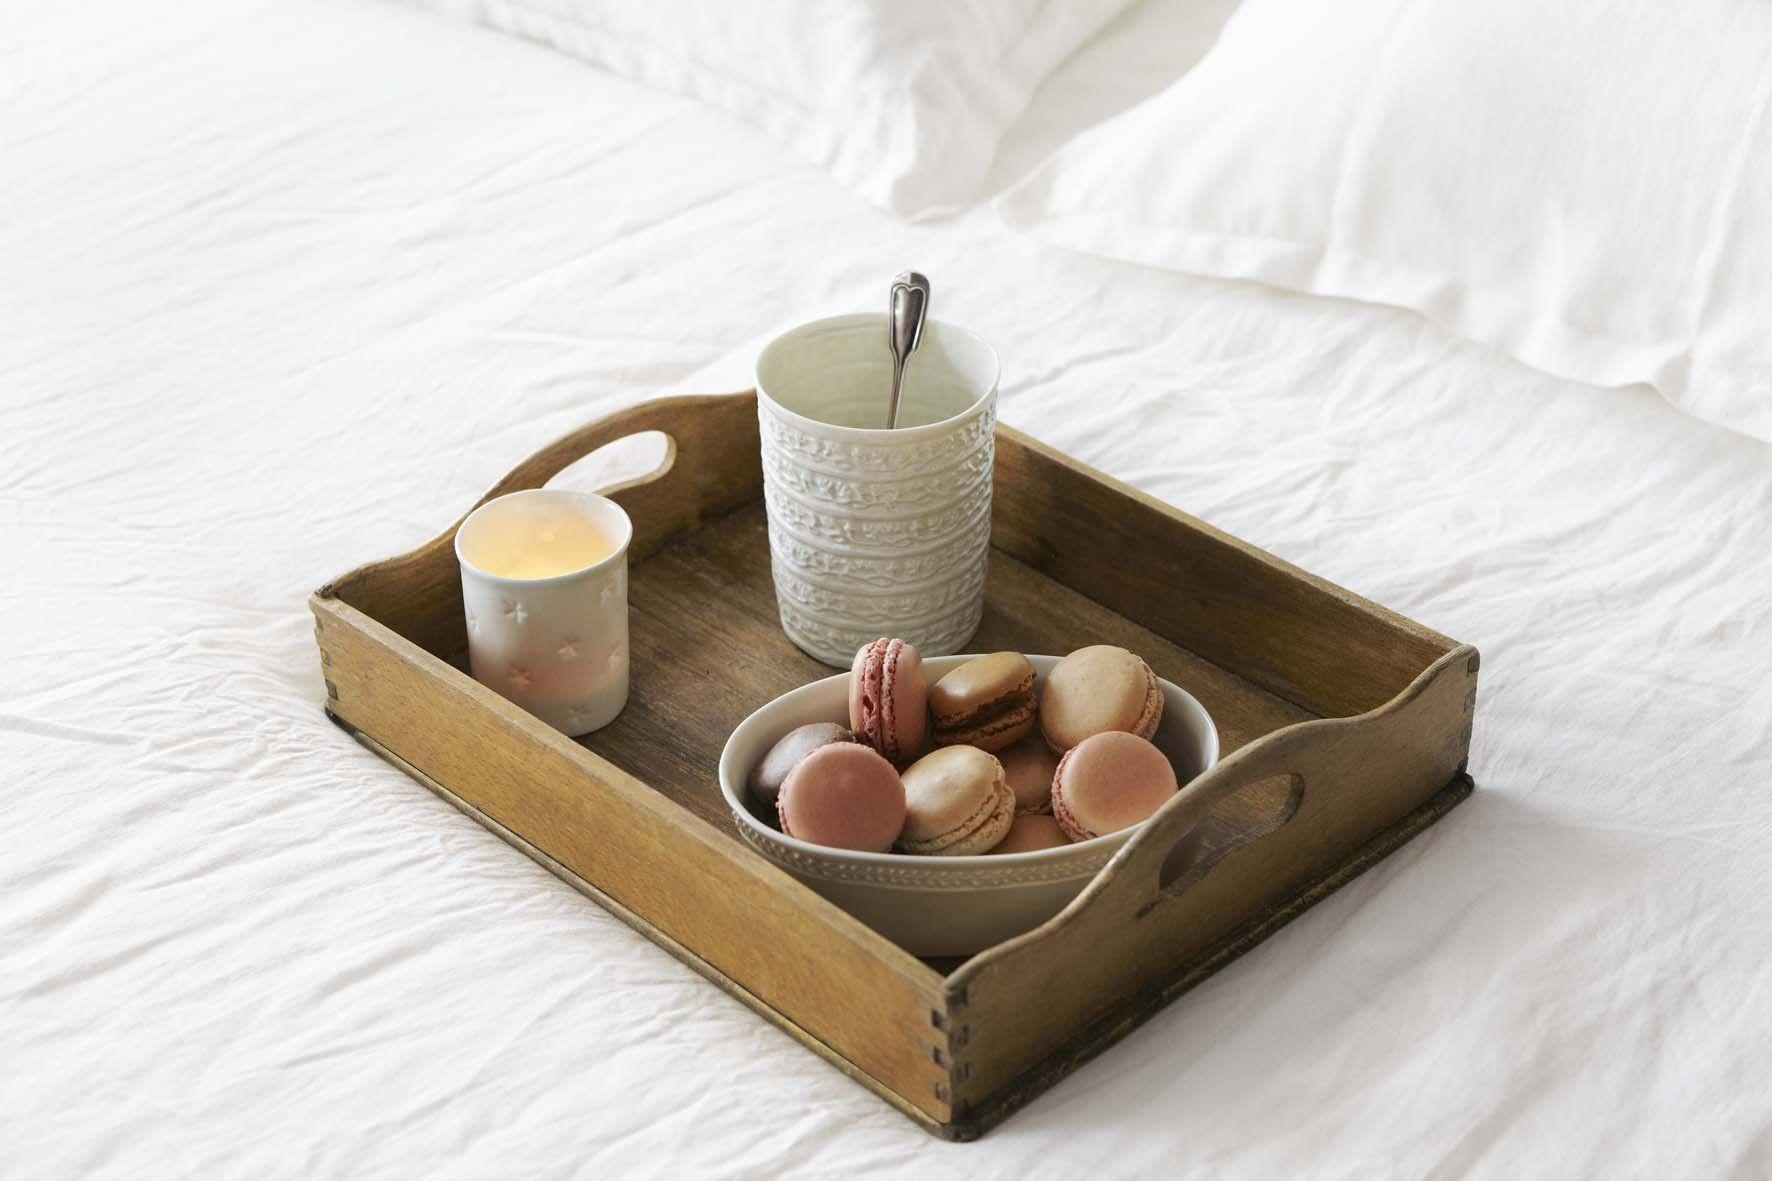 alix d reynis mood dinnerware cake factory et cheesecake. Black Bedroom Furniture Sets. Home Design Ideas